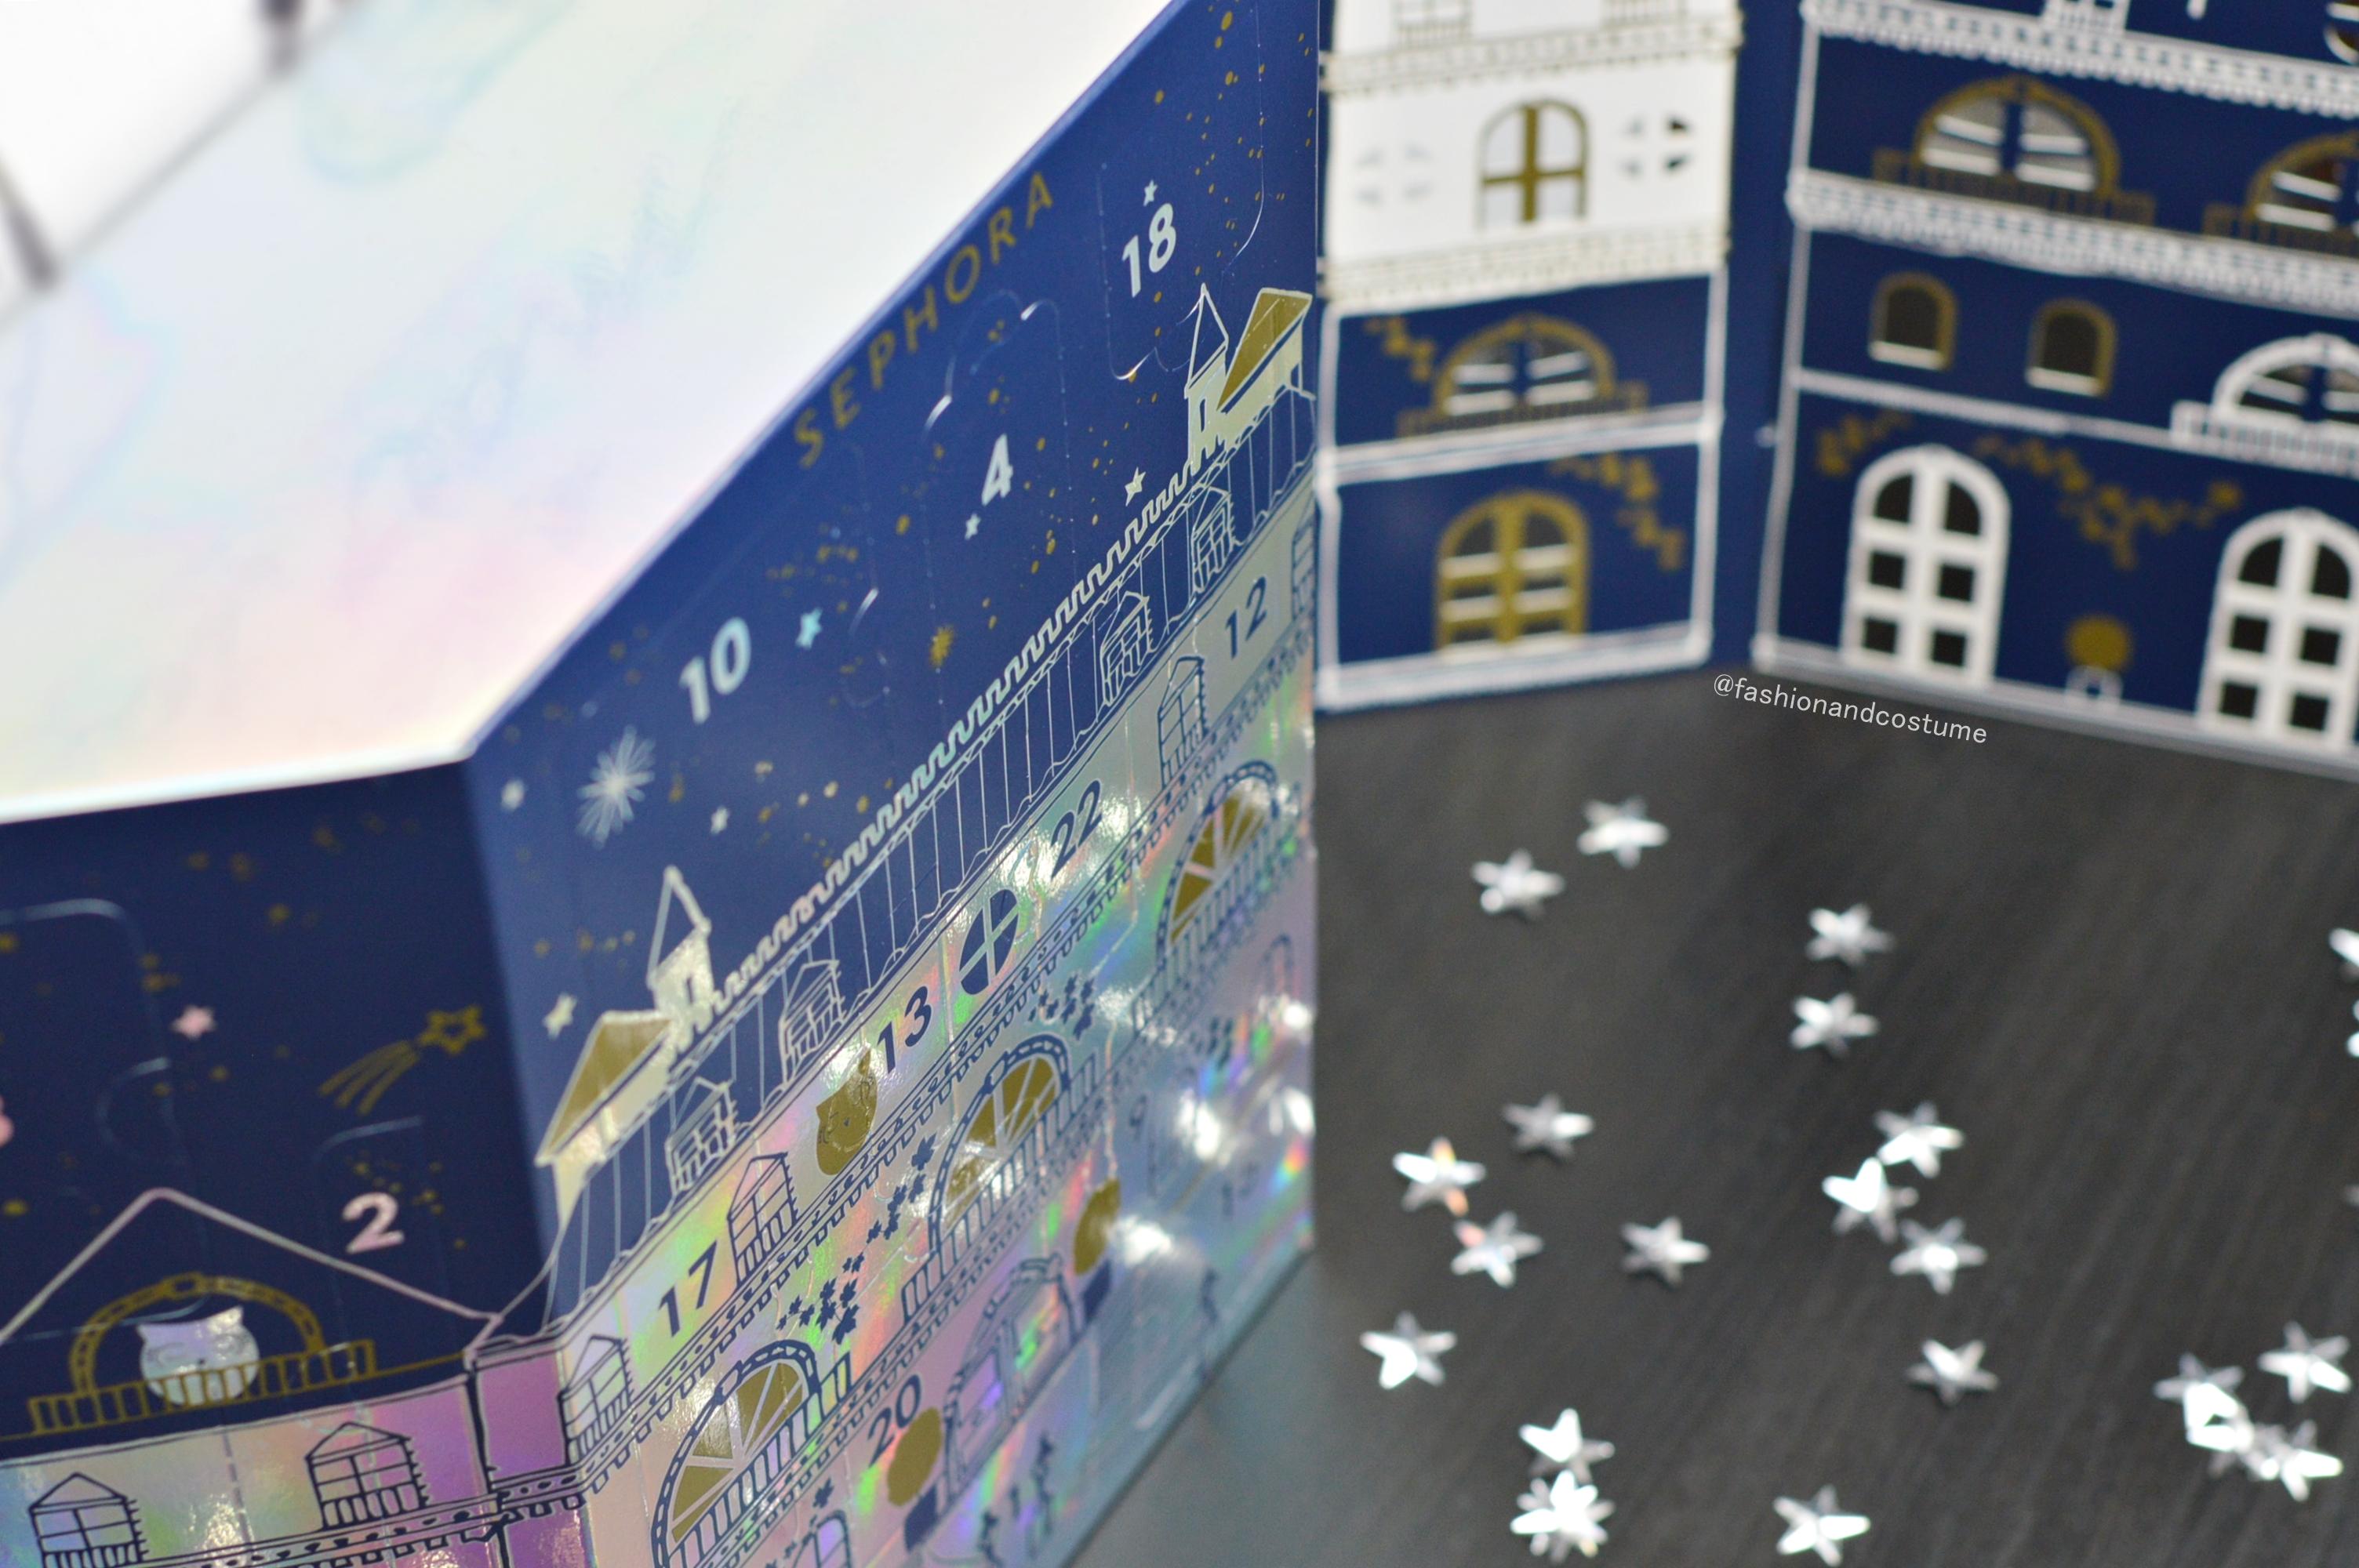 calendario-sephora-avvento-natale-regalo-beauty-makeup-sorprese-fashion-and-costume-fashionandcostume-christmas-2018-december